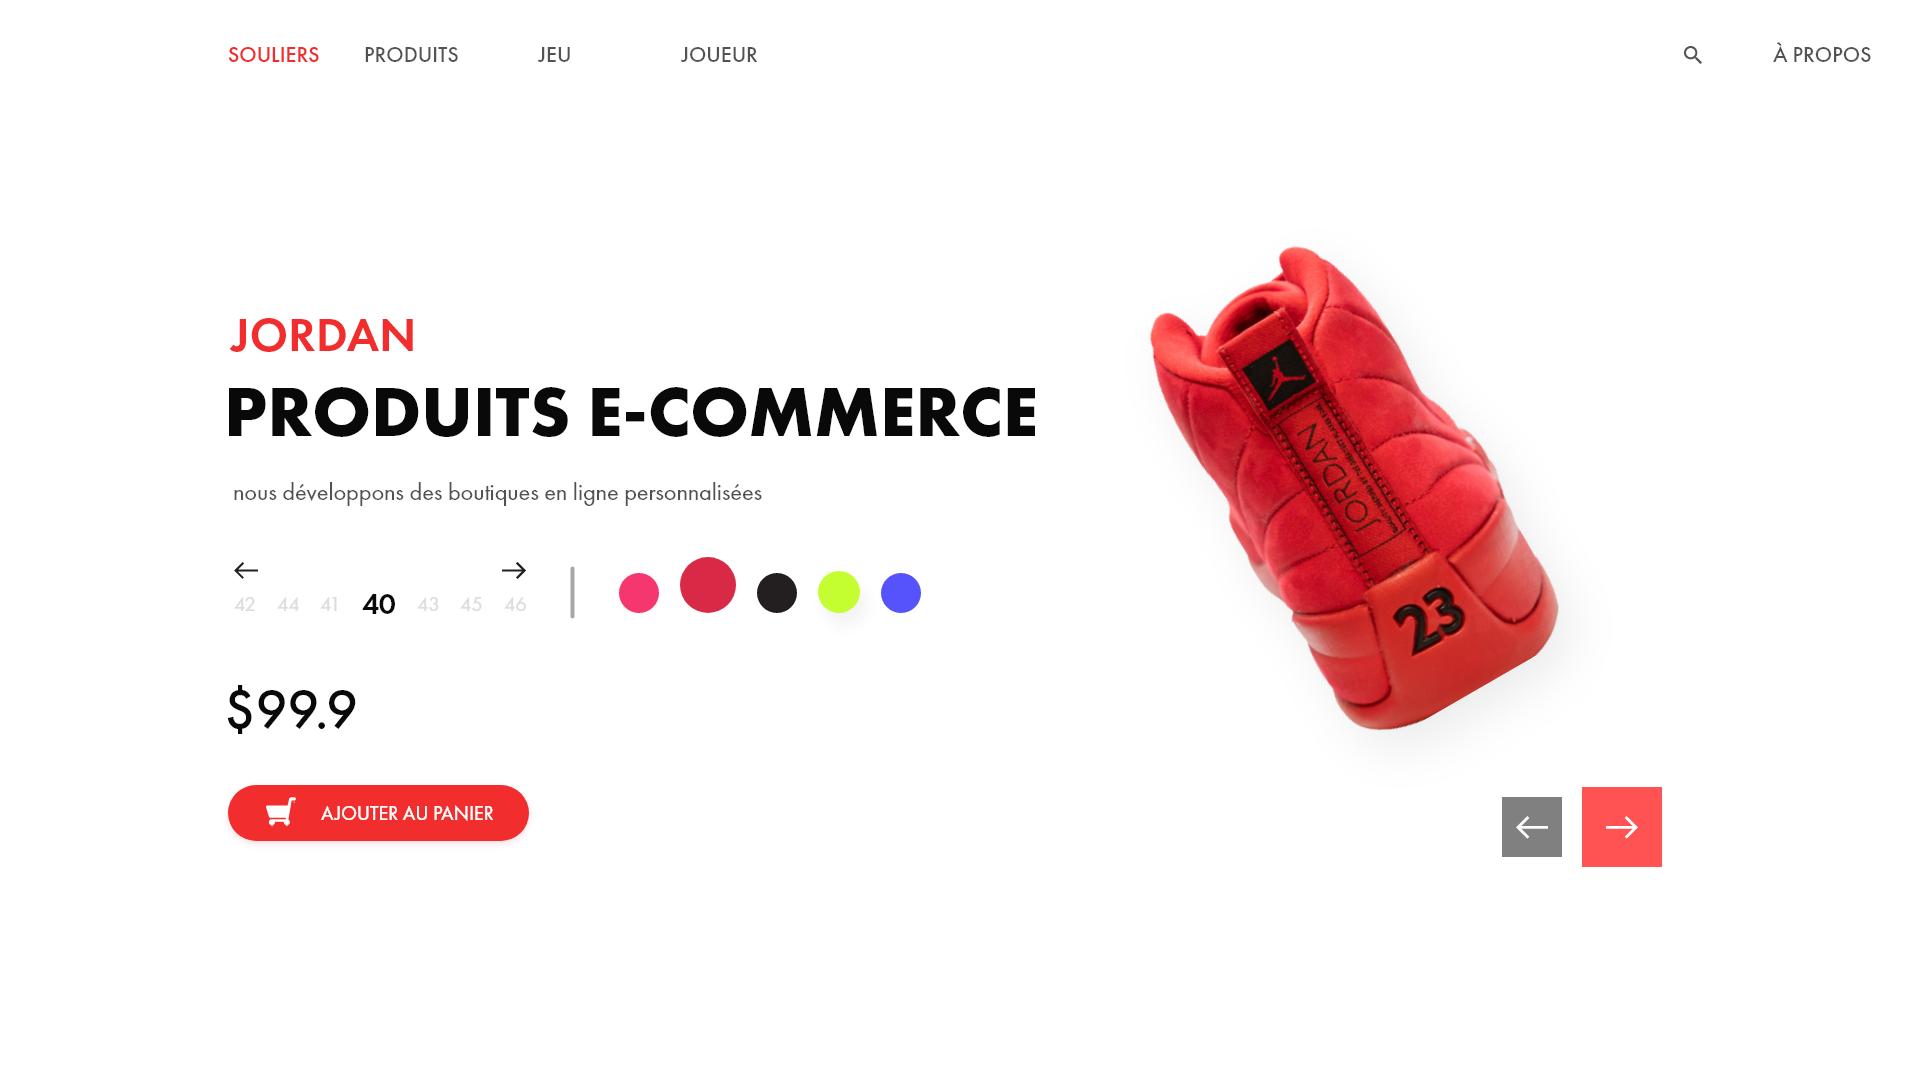 Produits e-commerce